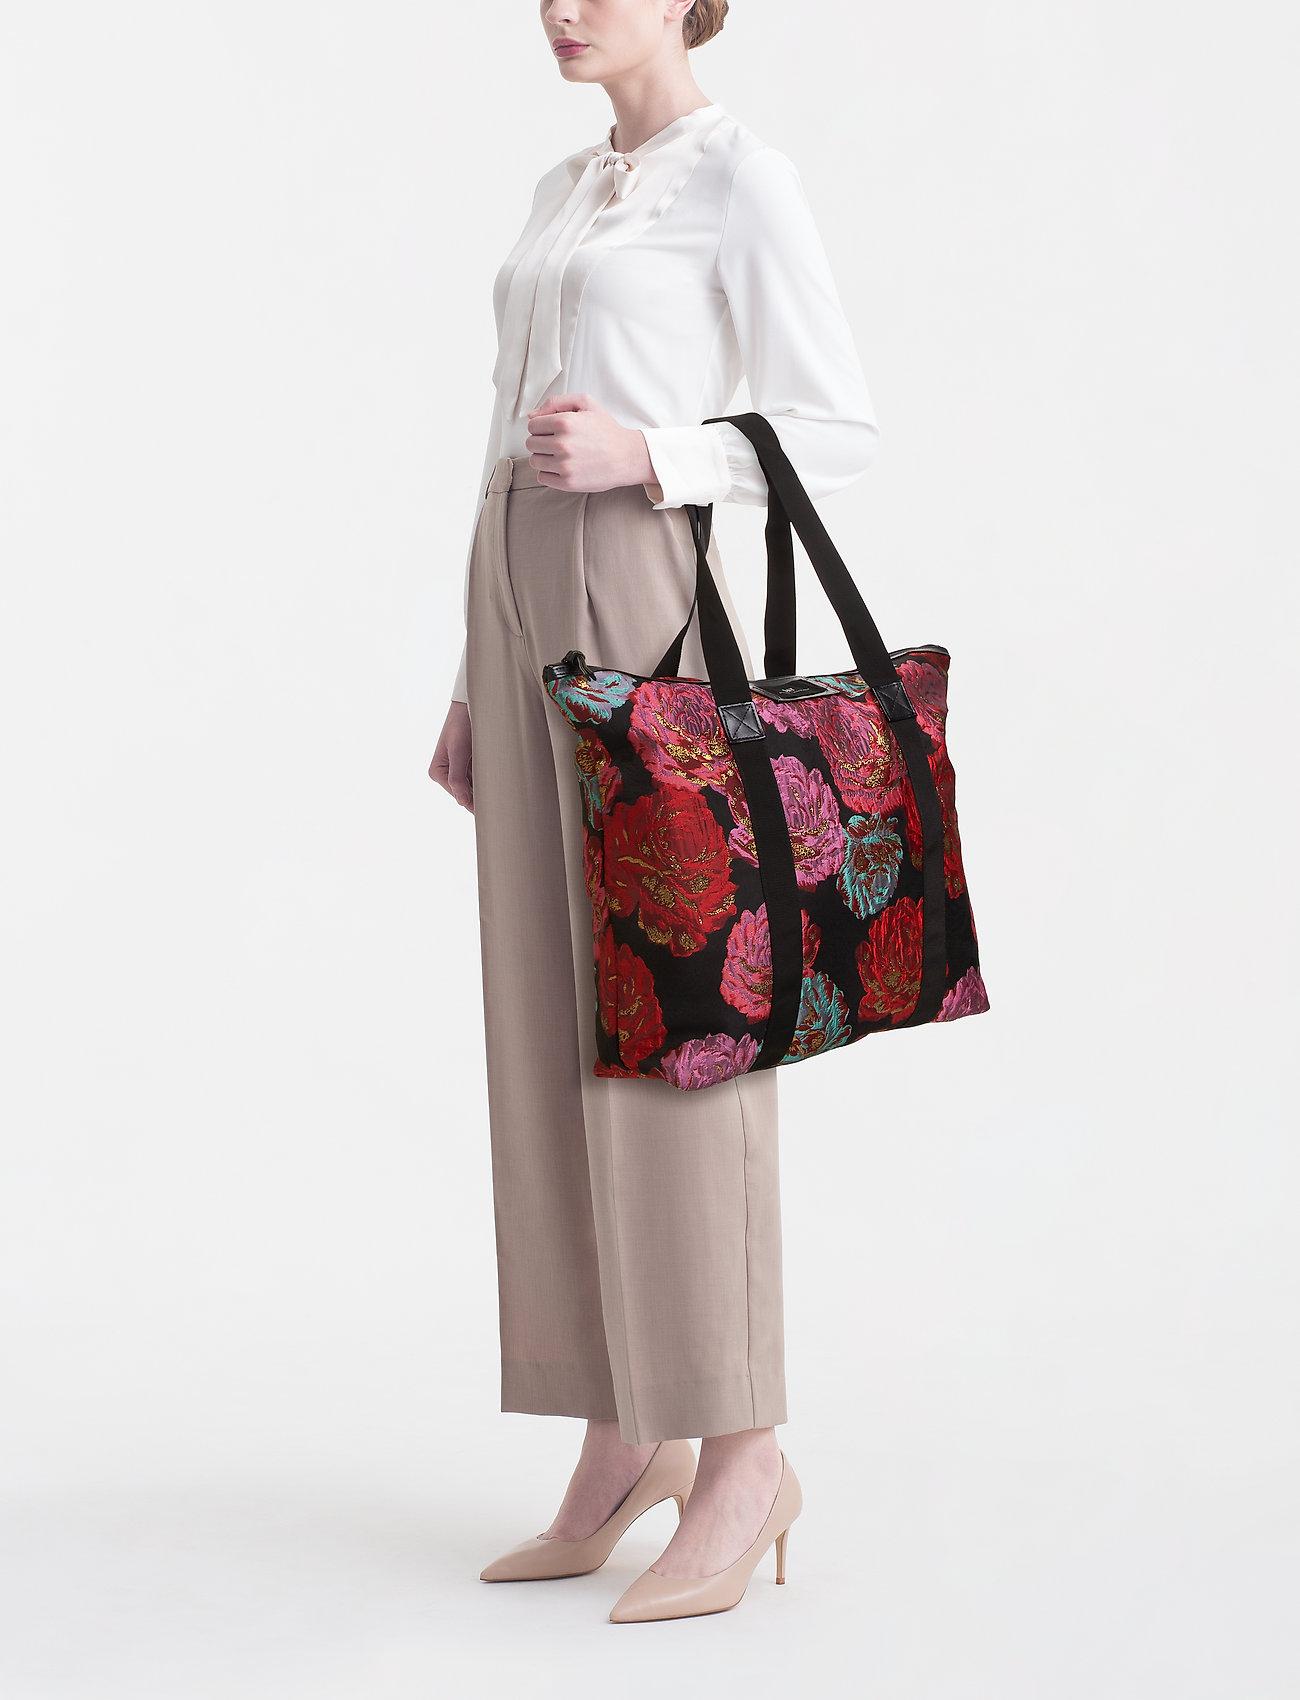 DAY et Day Gweneth Peony Bag